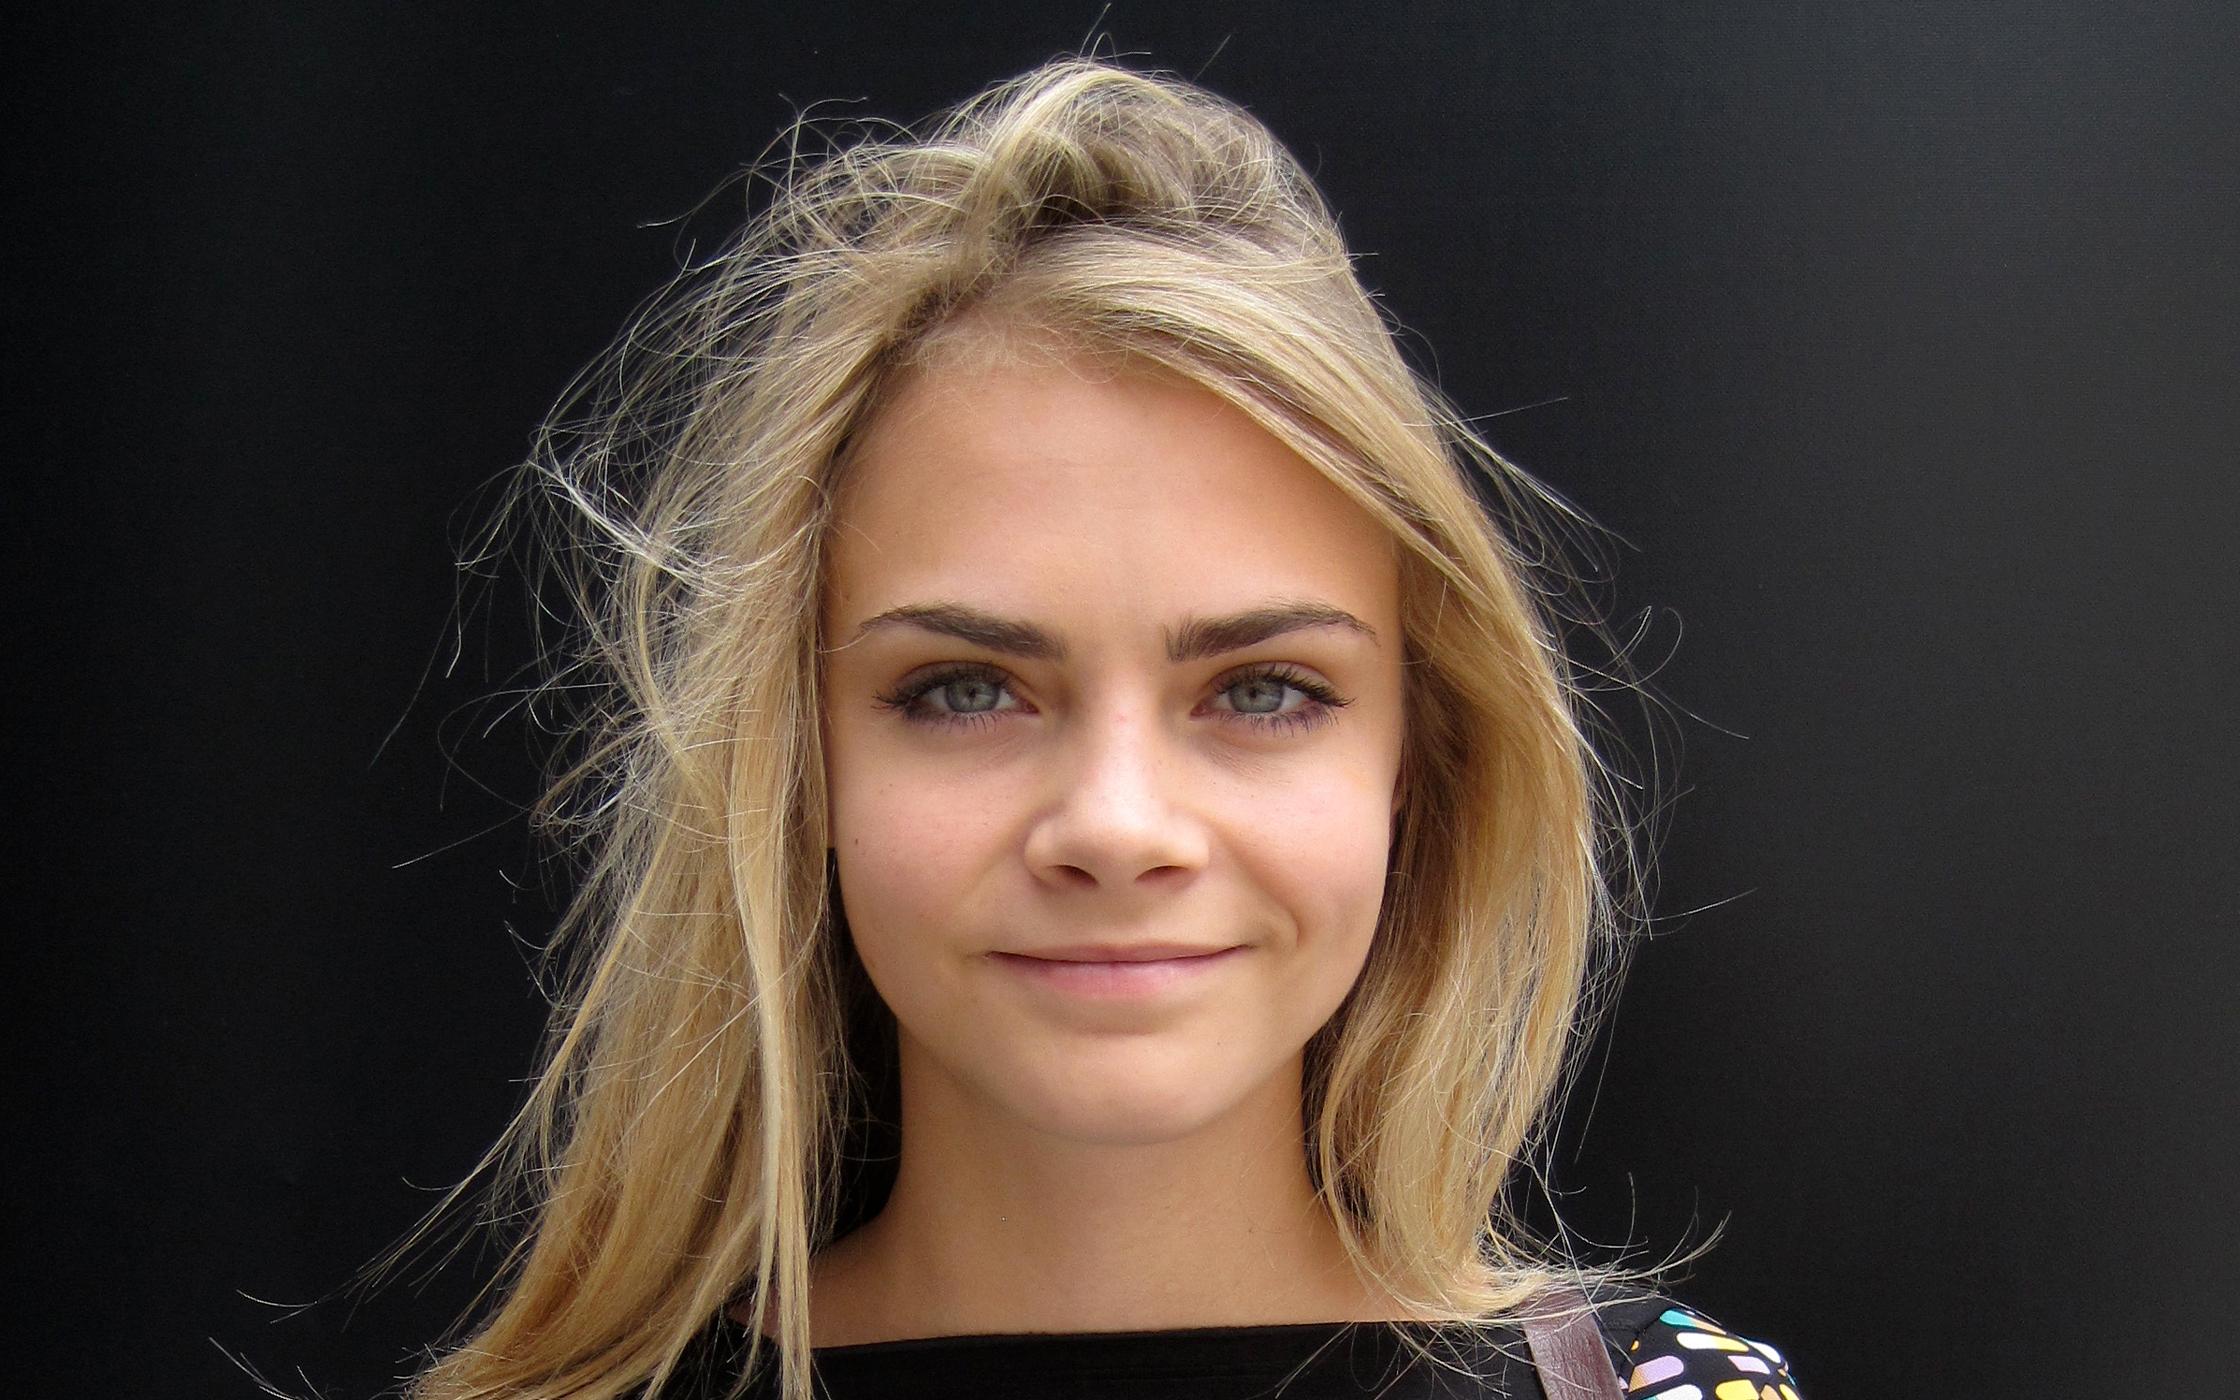 English Fashion Model Cara Delevingne